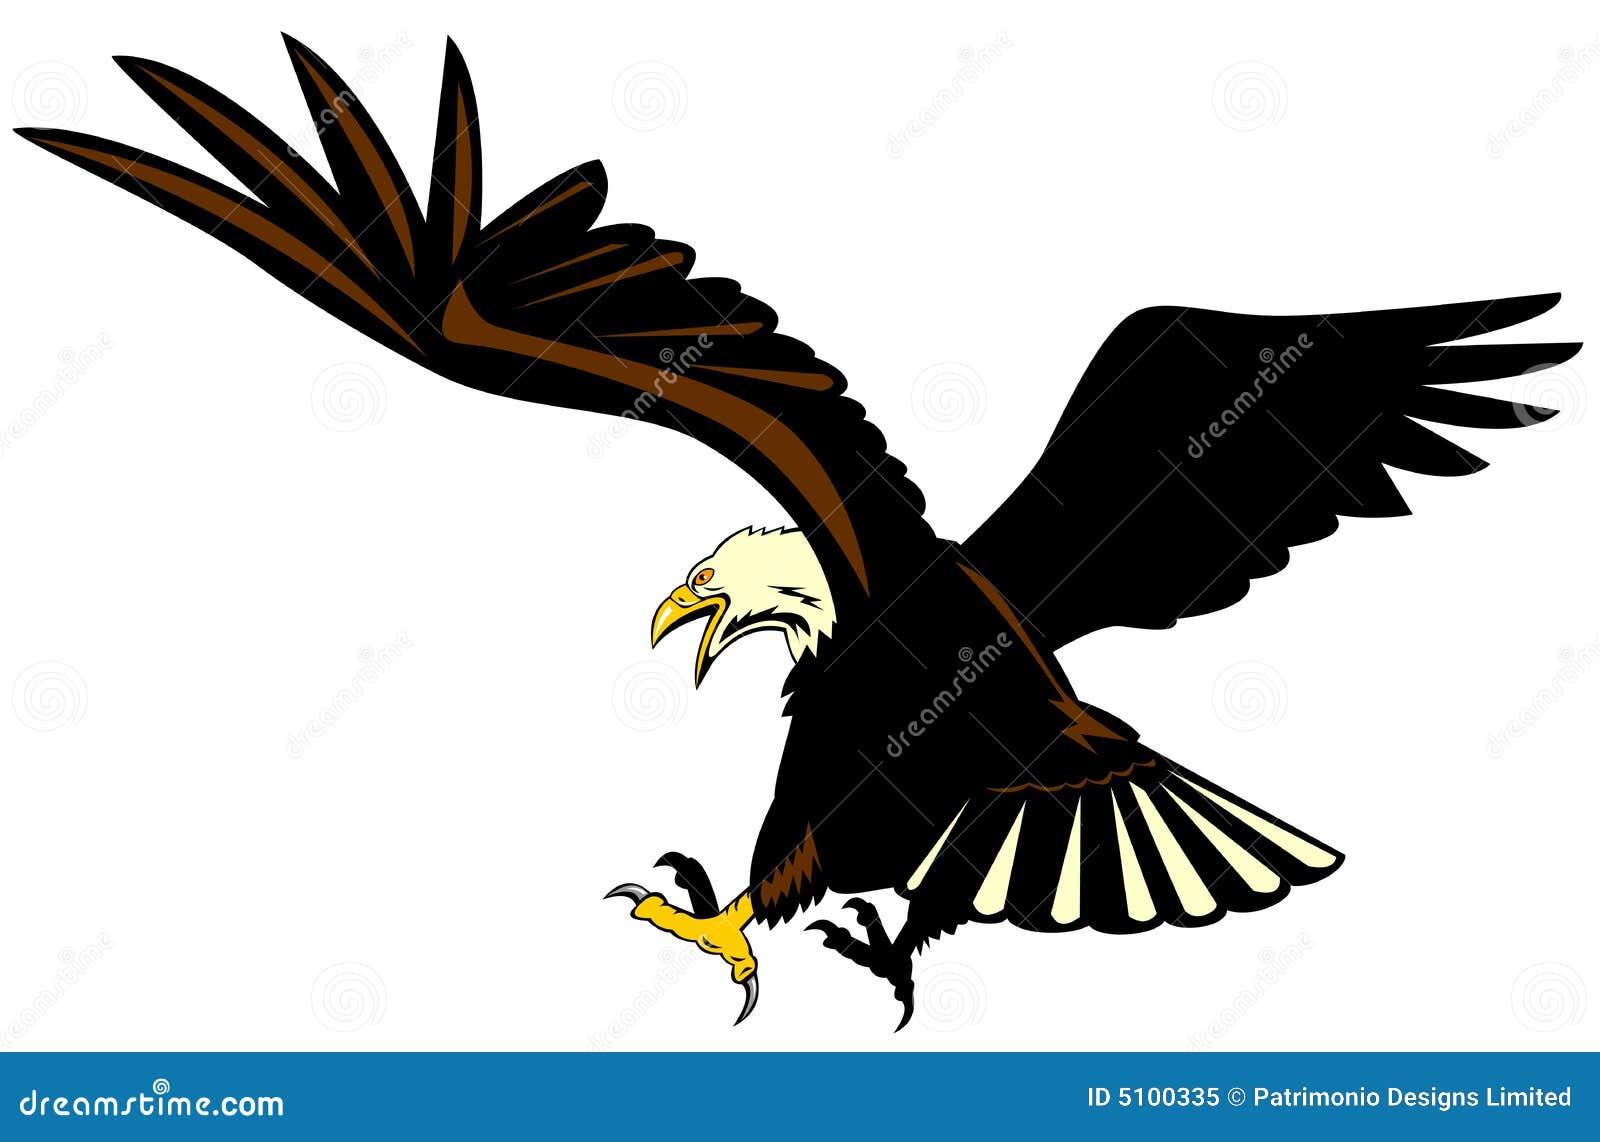 Eagle attacking stock illustration. Image of flight, bald ...